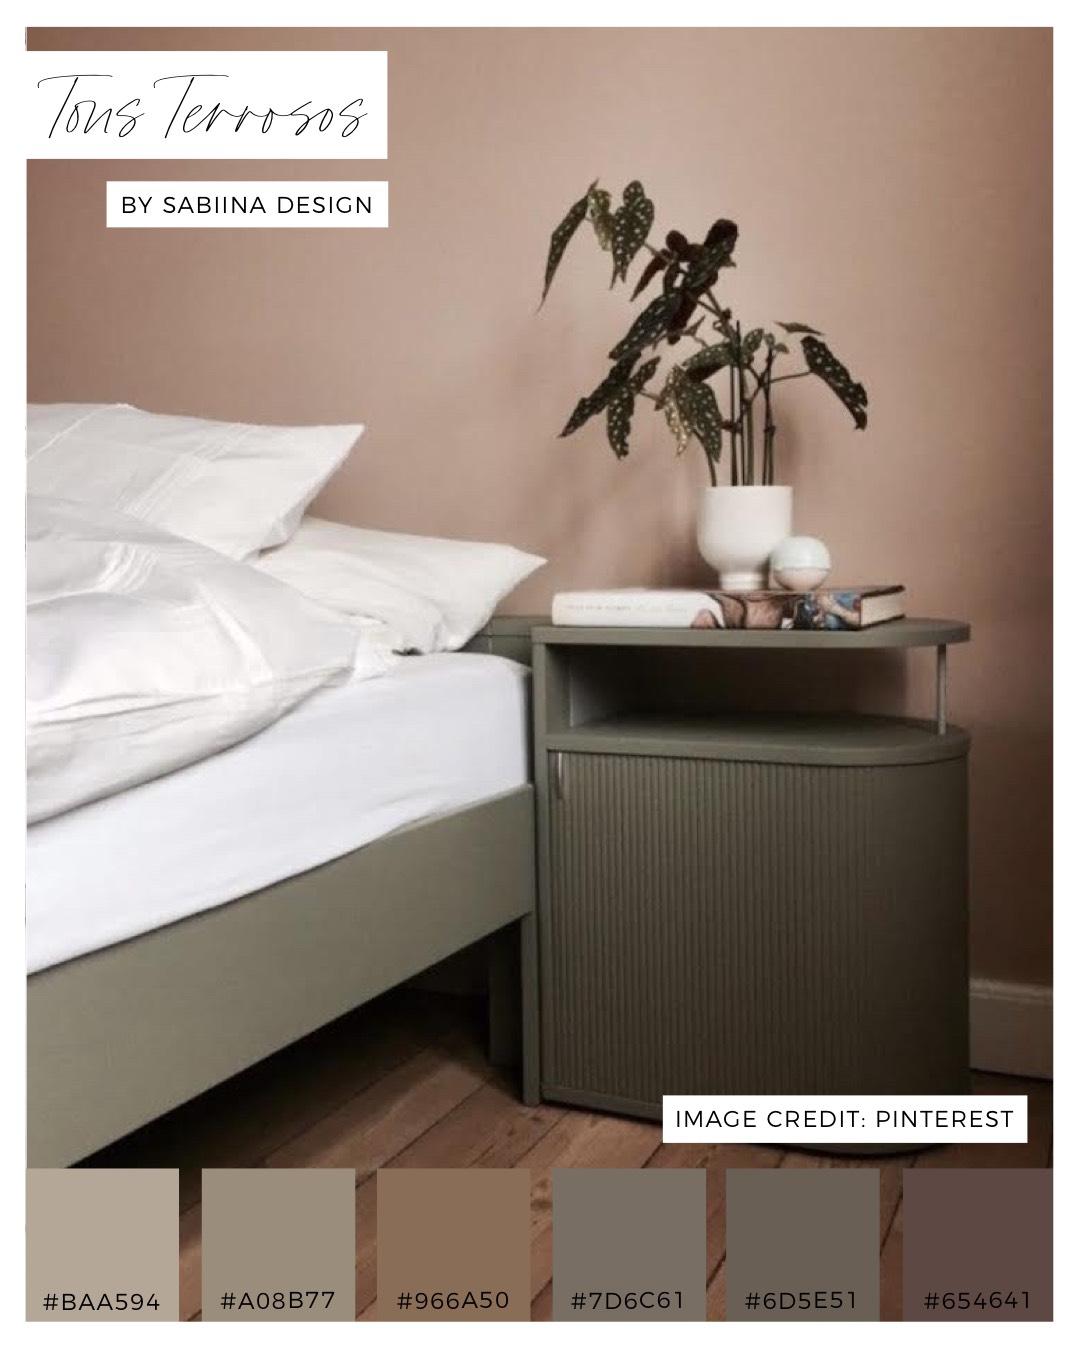 Atelier Sabiina Design